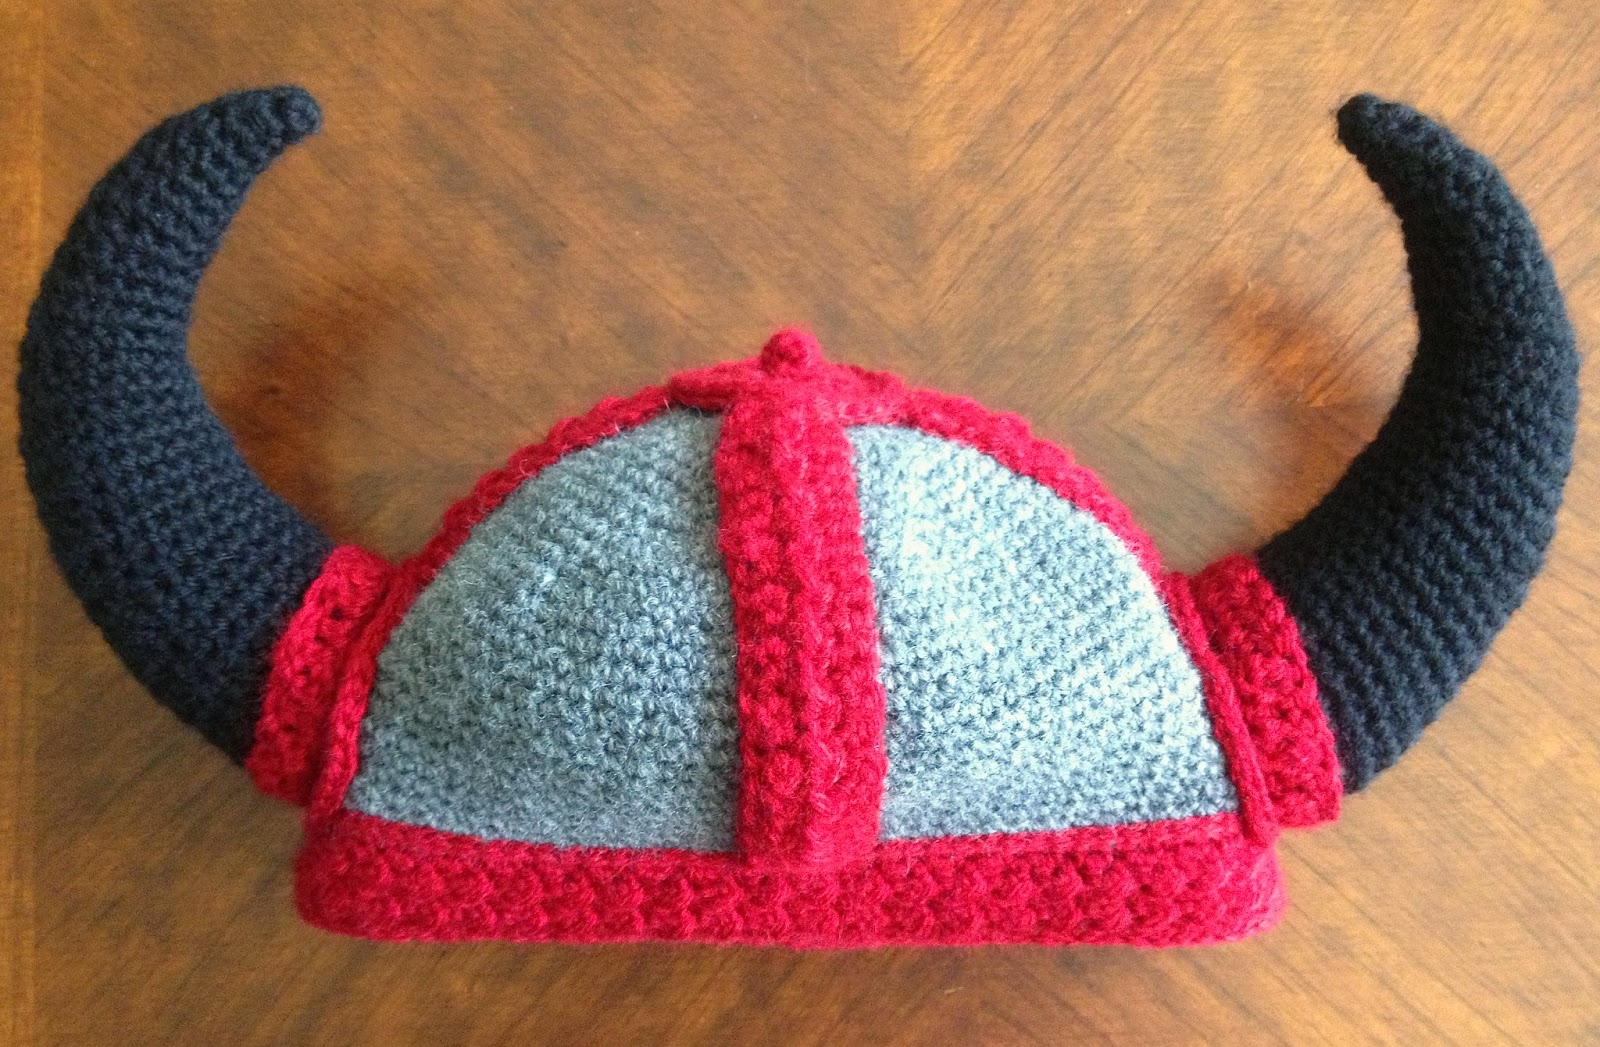 Illuminate Crochet: March 2014